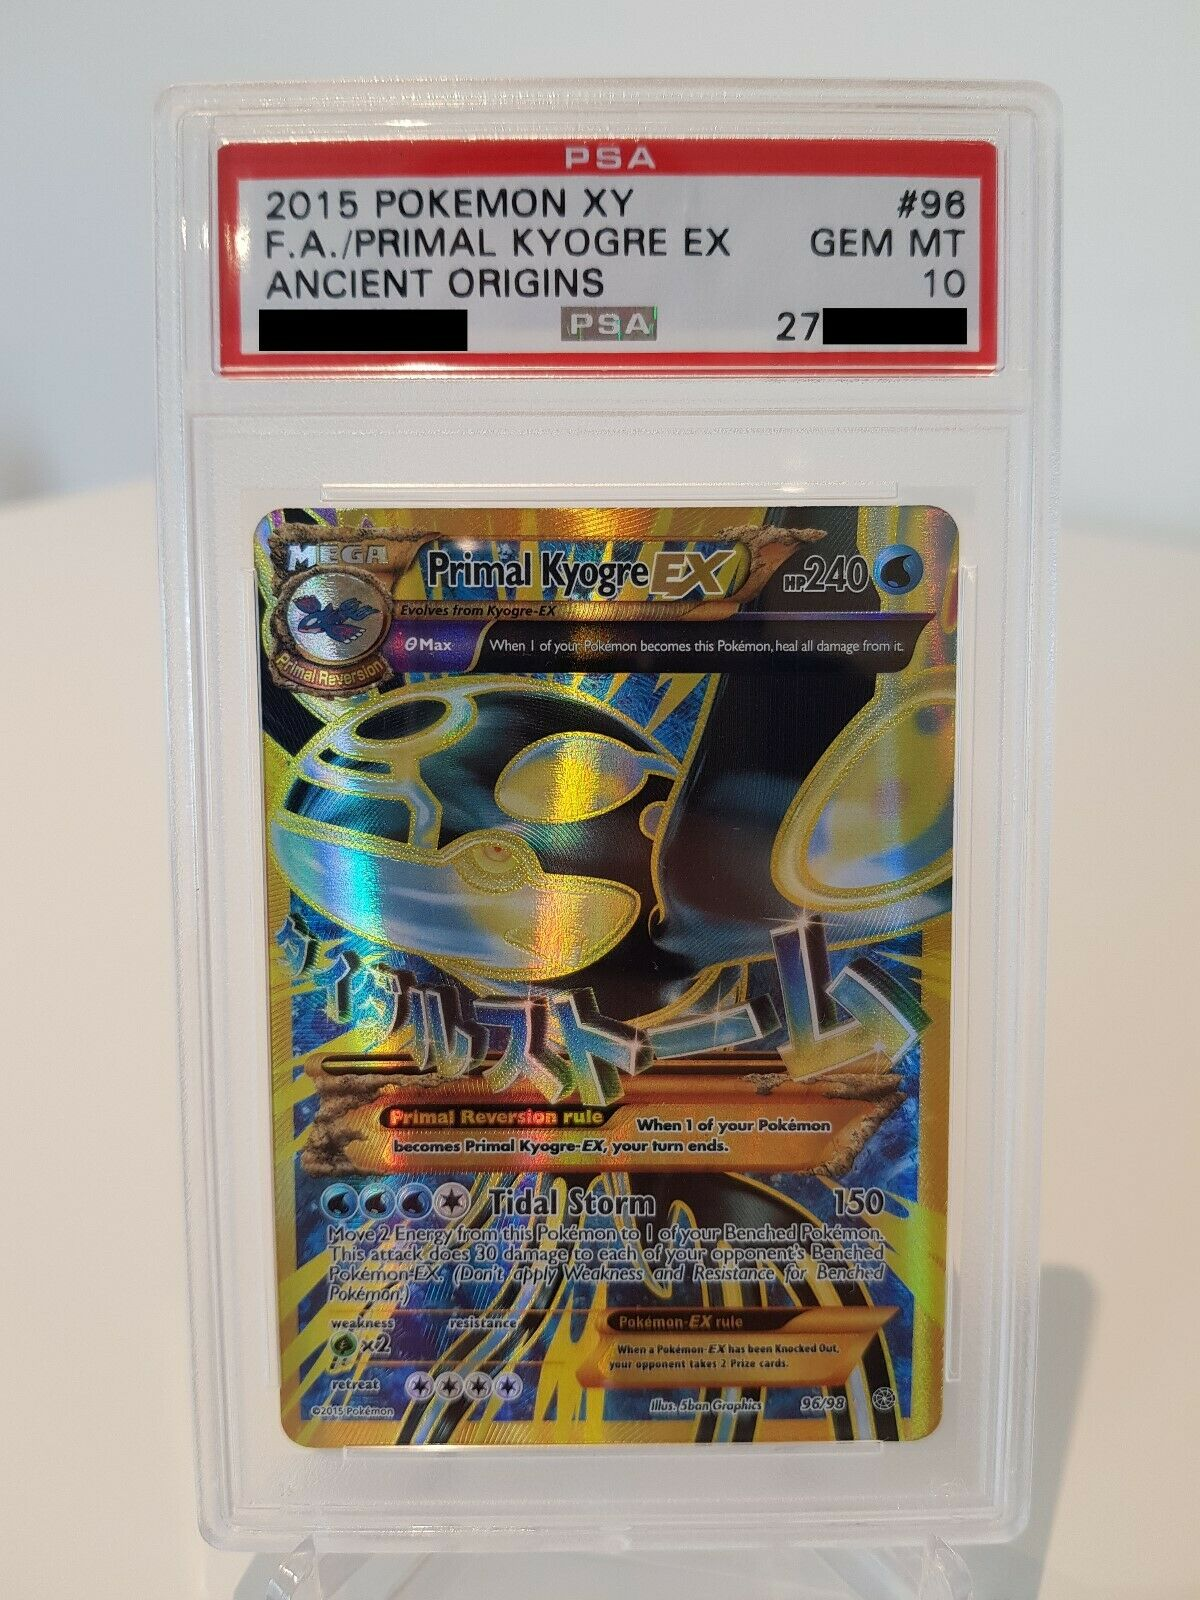 Pokemon Karte ProtoKyogre EX PSA 10 Gem Mint Ewiger Anfang XY07 9698 Primal